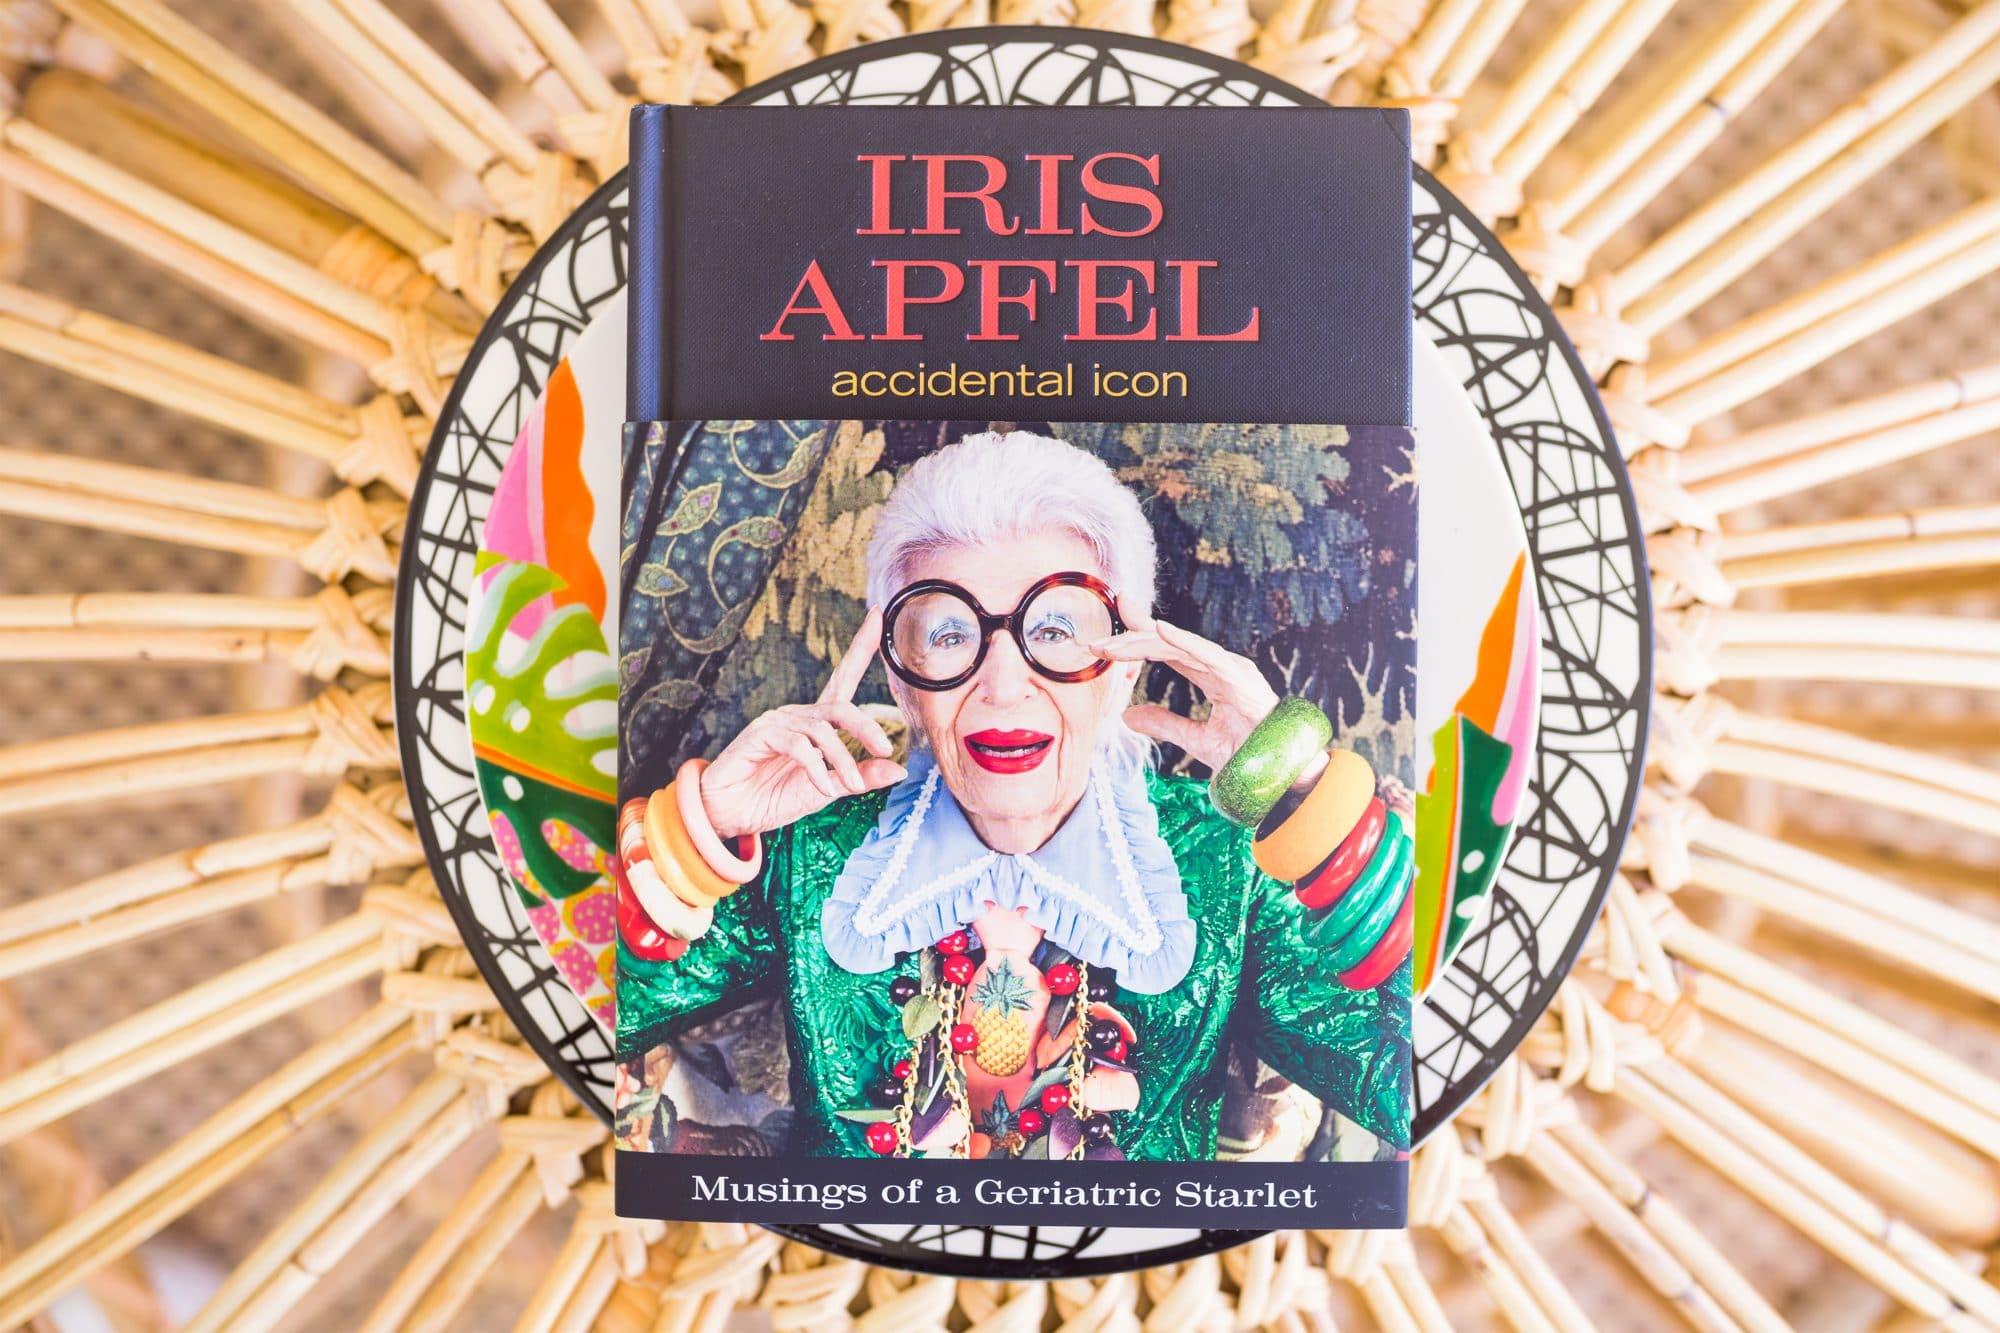 Iris Apfel Grandin Road Collection - www.ashleybrookedesigns.com